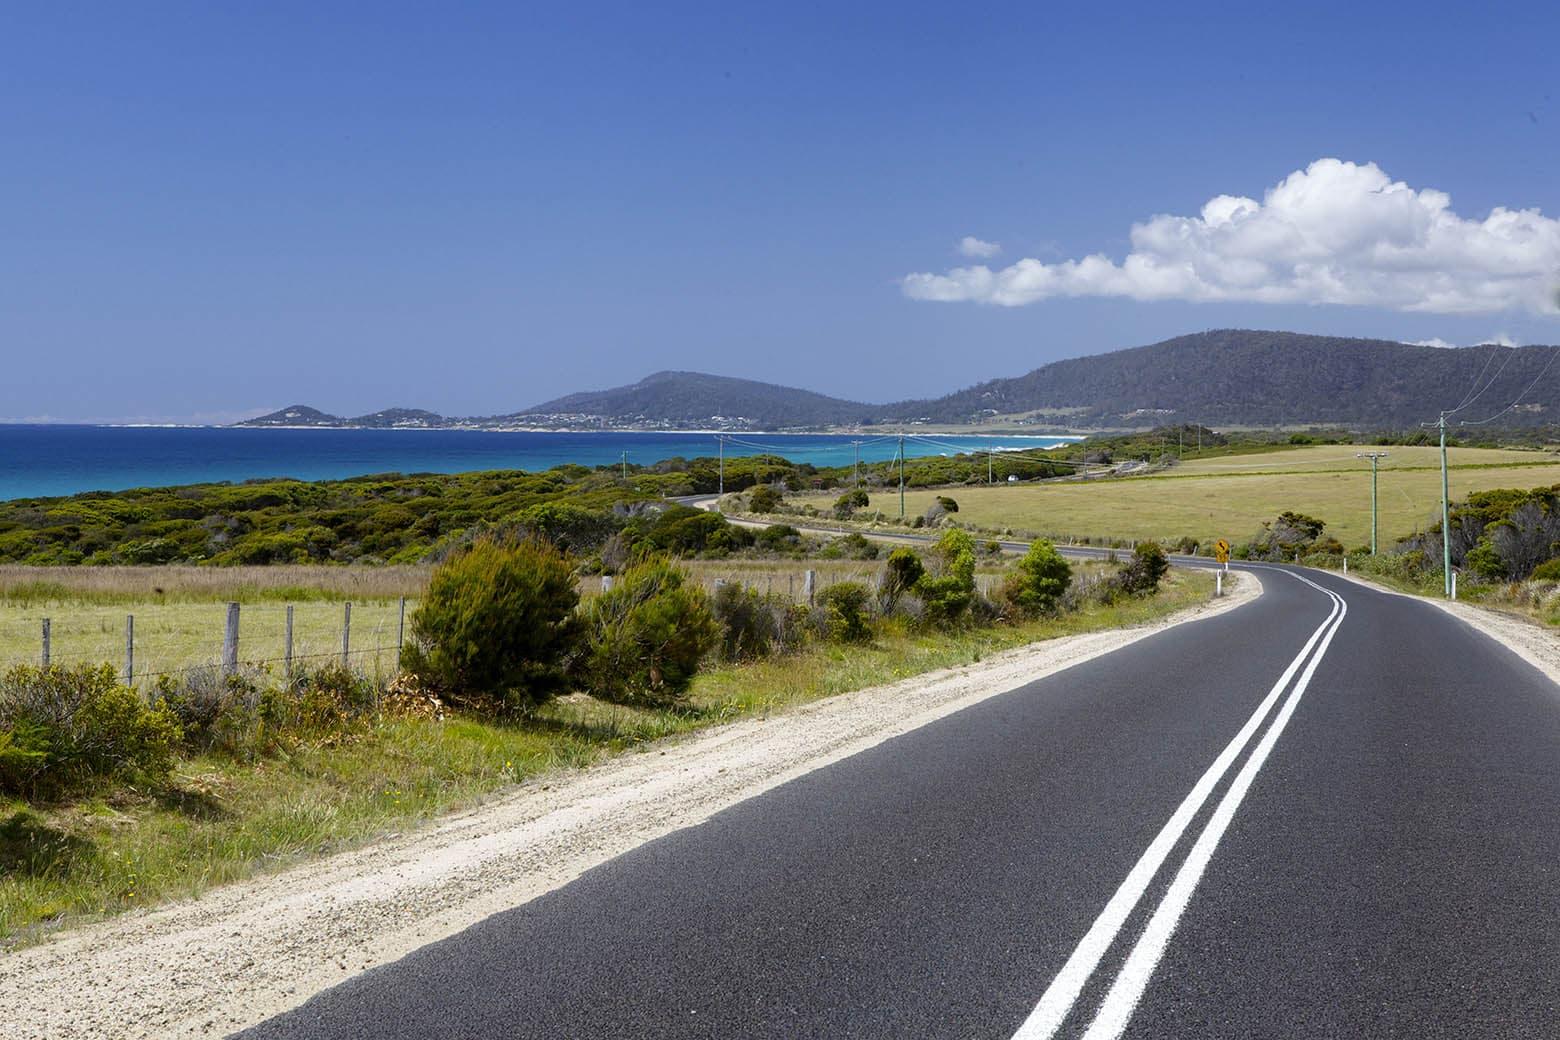 Open roads of the East Coast - Tasmania Road trip